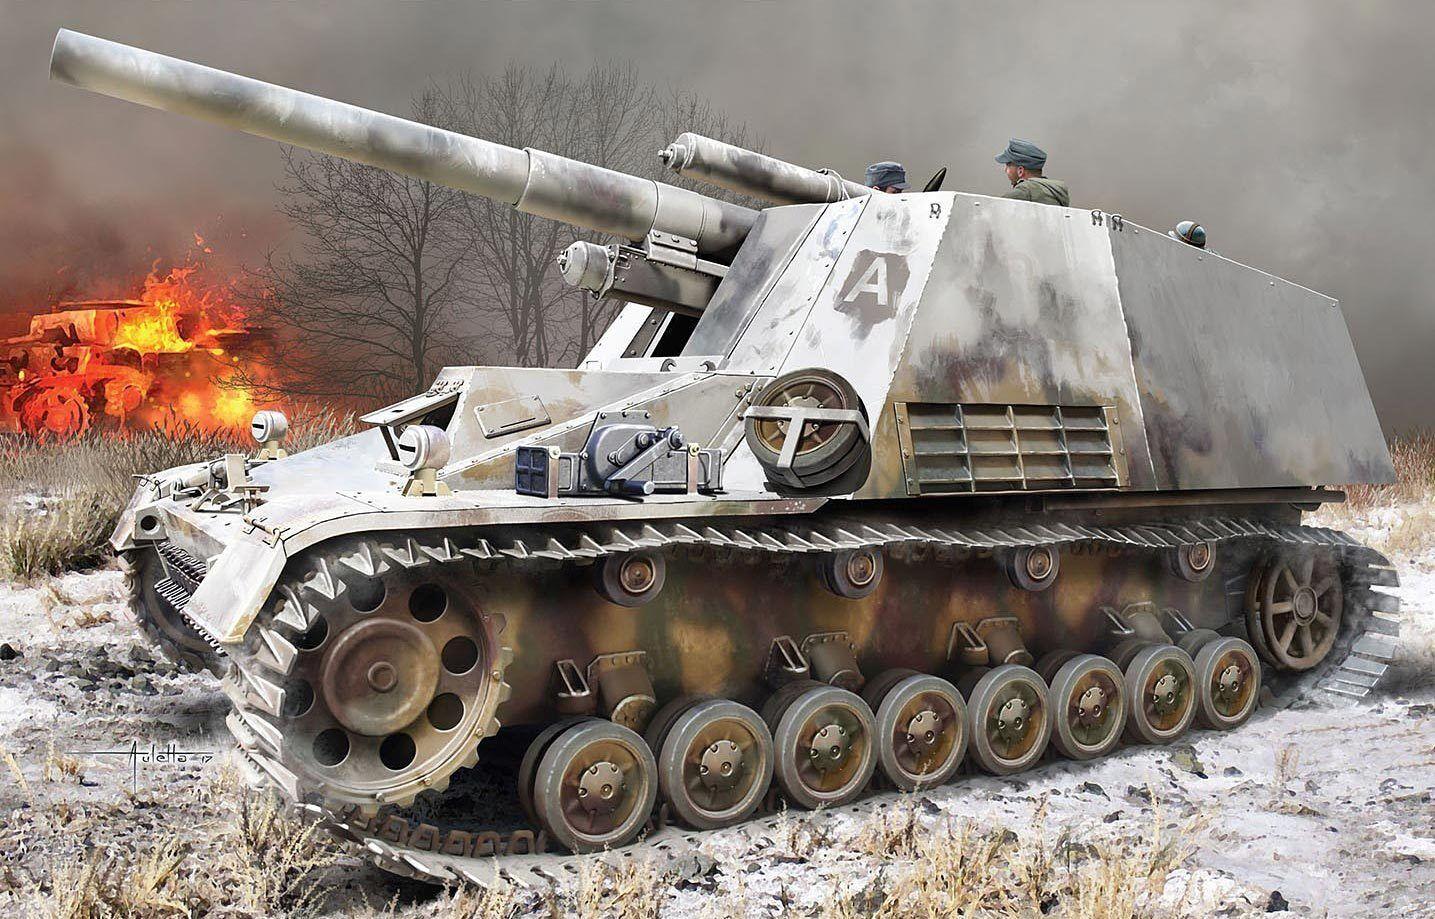 Dragon 1 3 5 6876  Solid sd.kfz.165 Hummel - with Winterketten